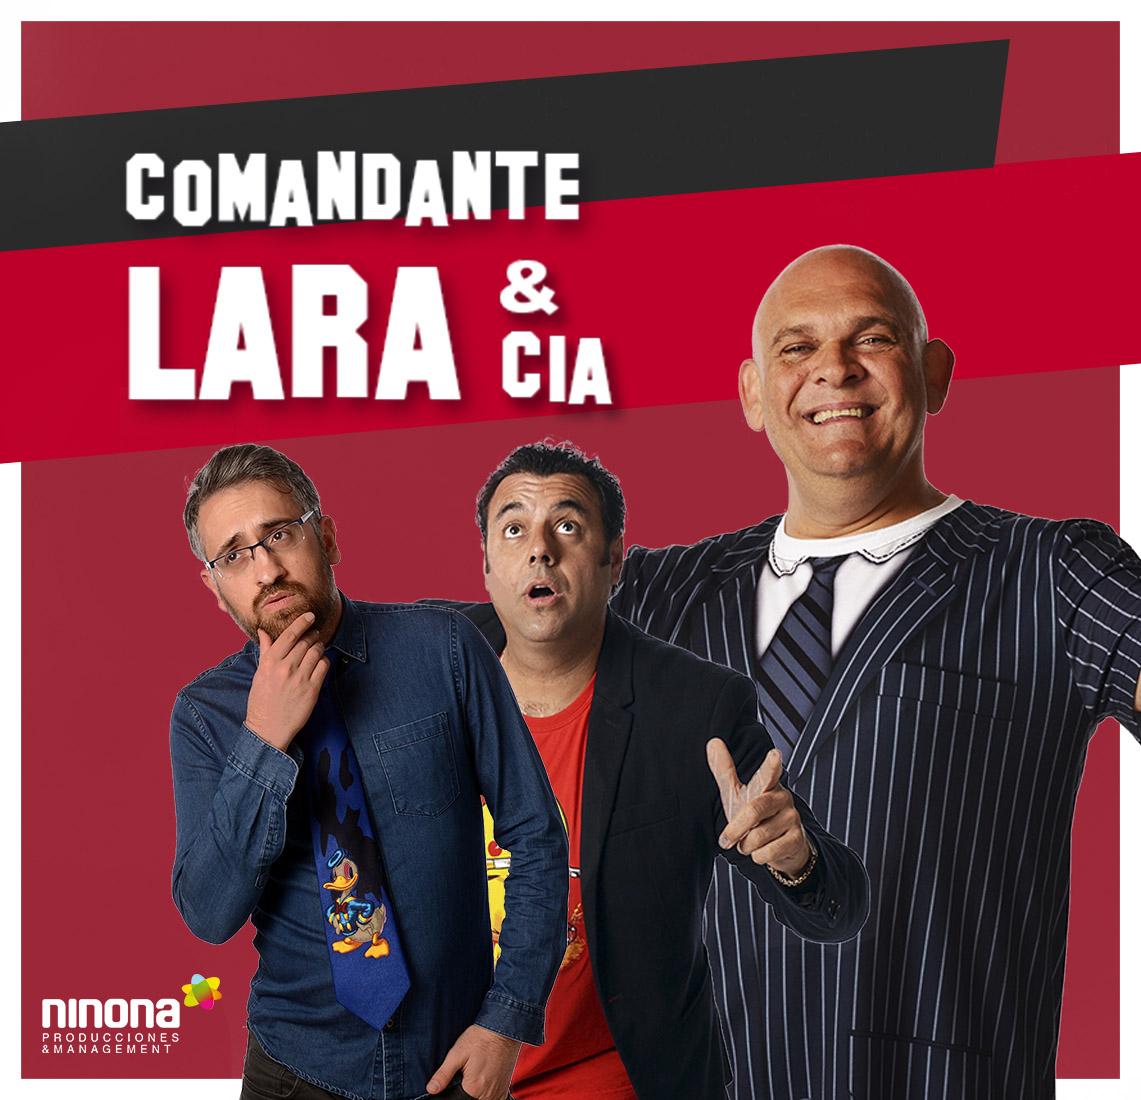 comandante-lara-and-cia-5defdcc98815a.jpeg